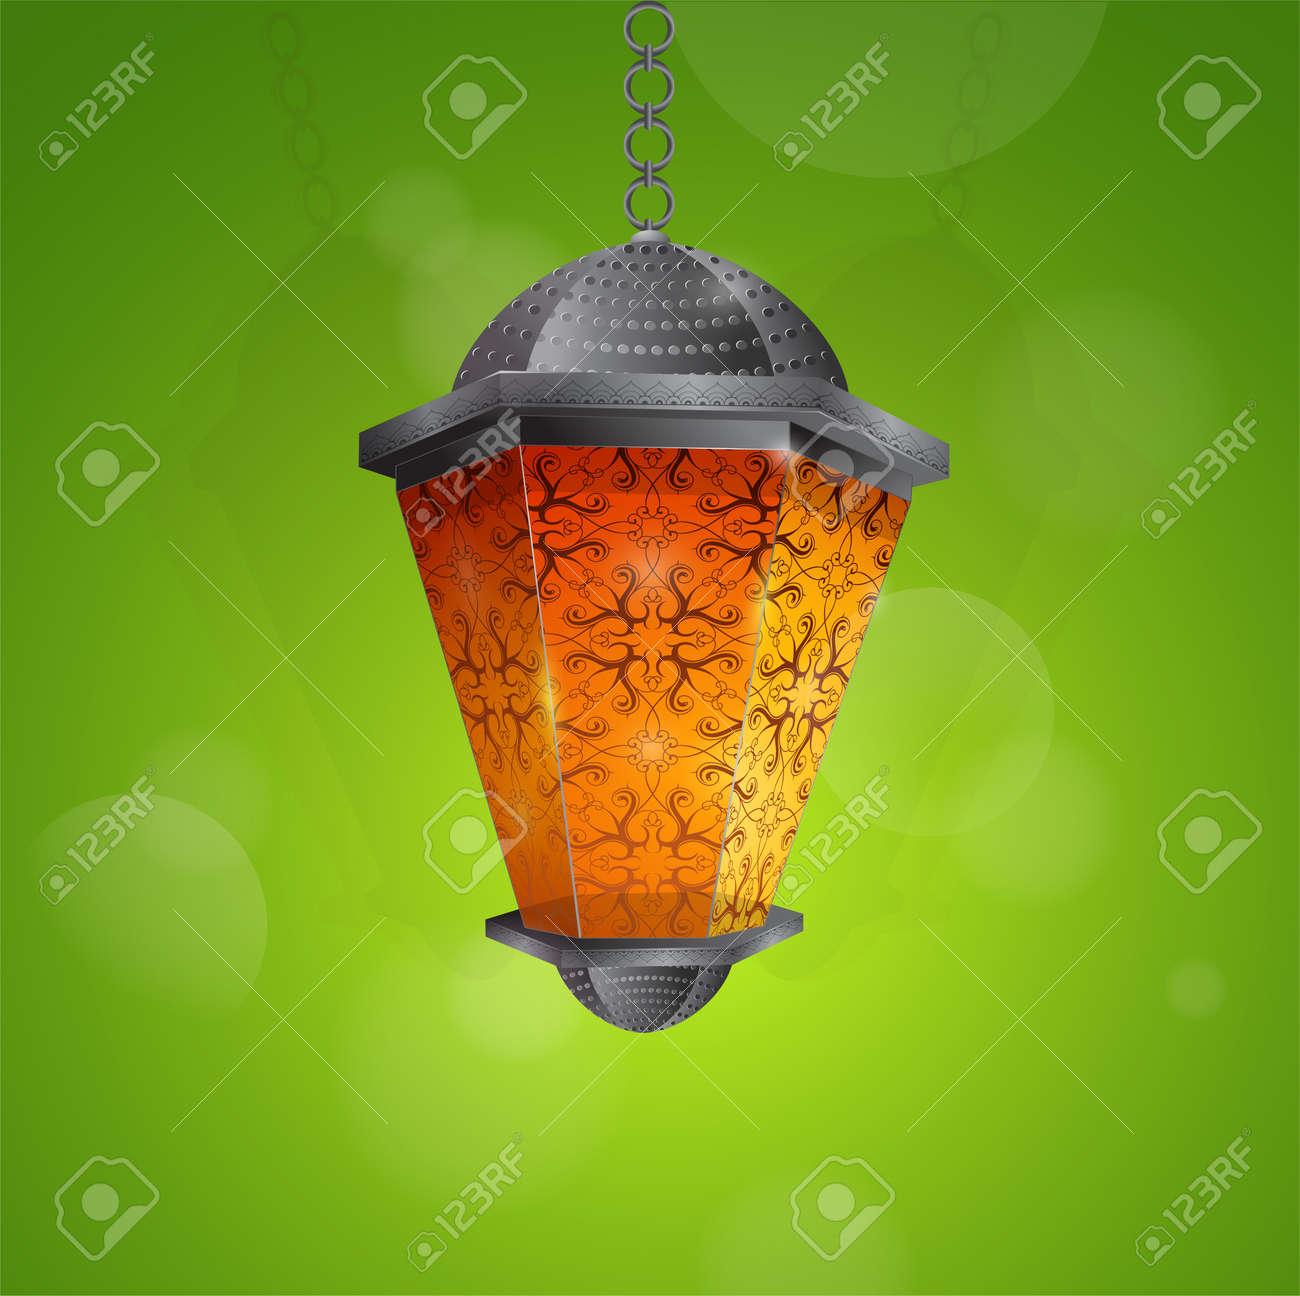 Arab lantern as traditional decoration for islamic holy month arab lantern as traditional decoration for islamic holy month ramadan greeting card design eps m4hsunfo